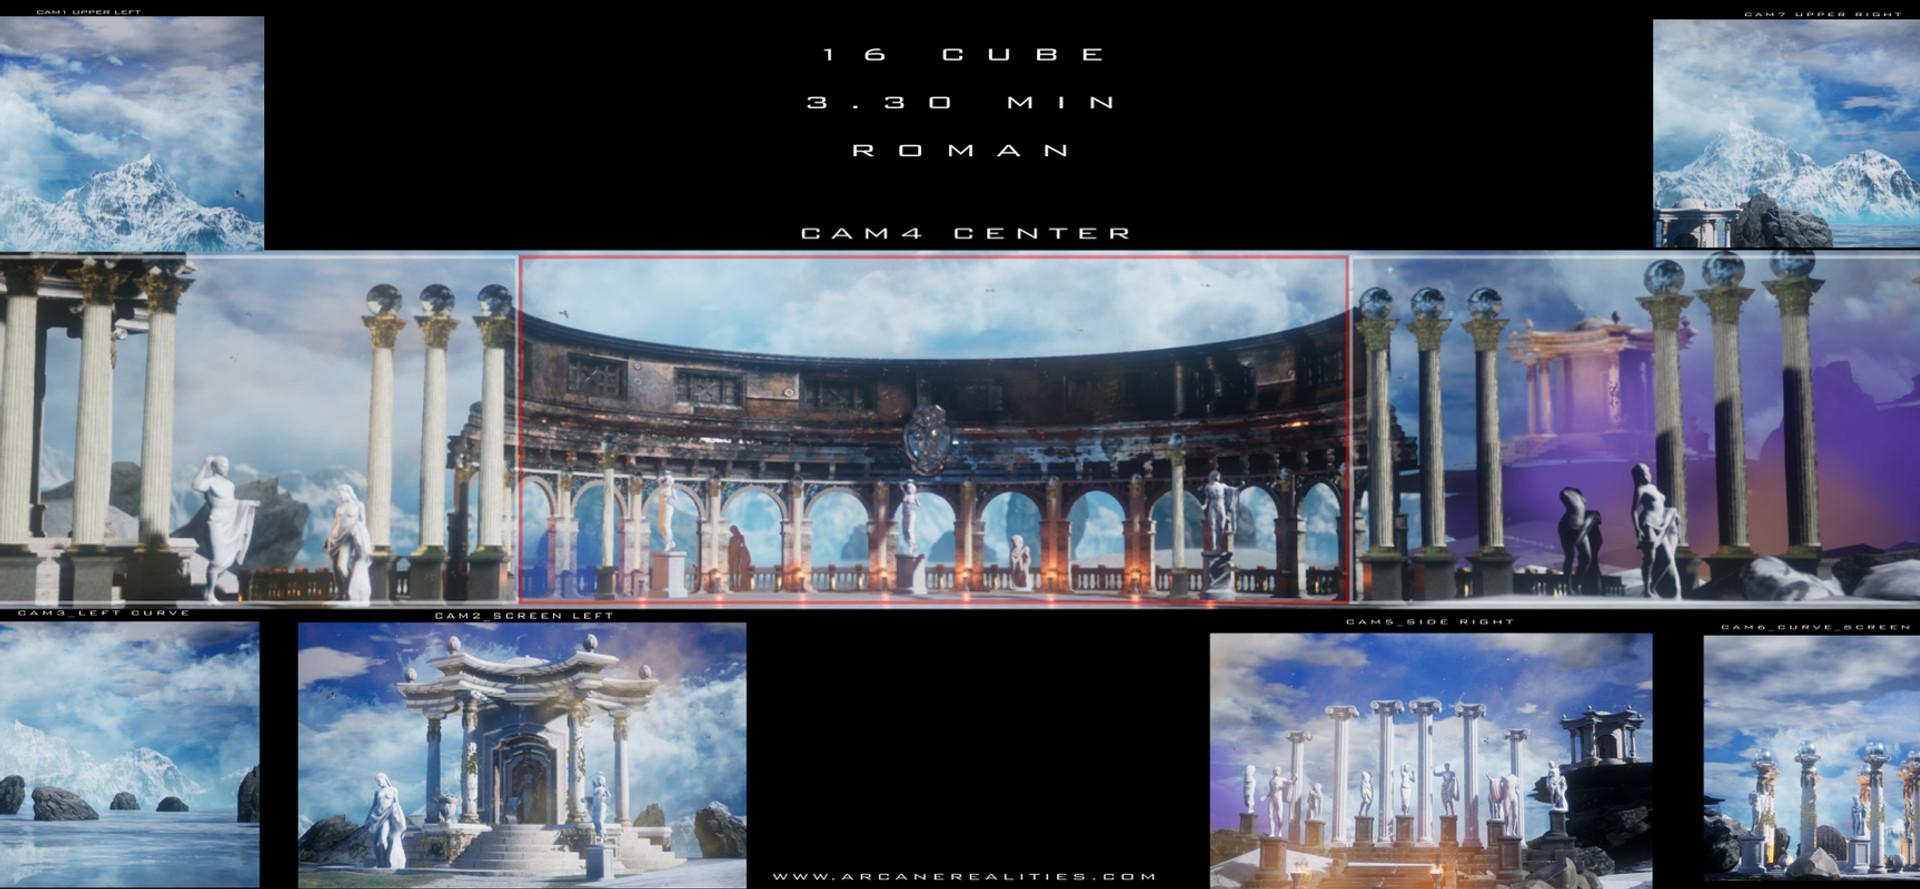 16 Cube roman all.jpg